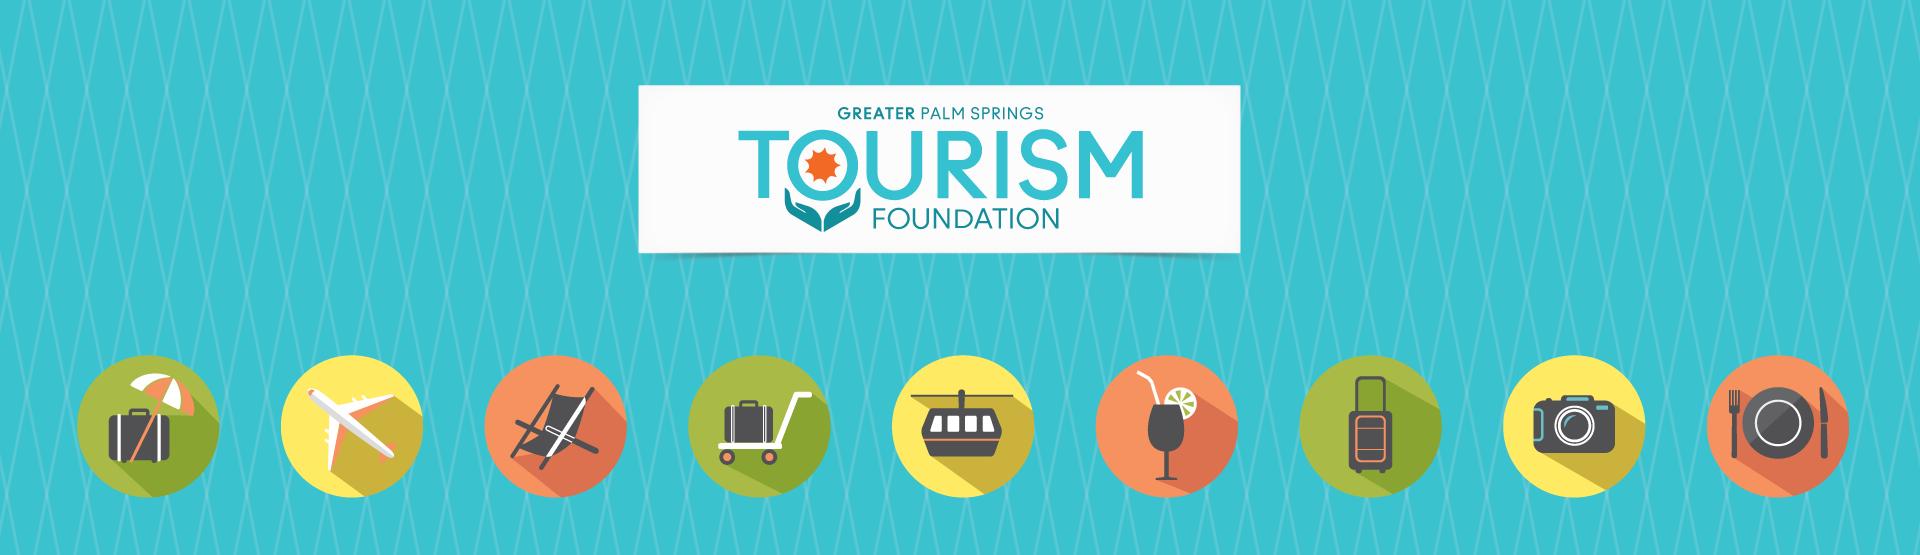 Tourism Foundation header image